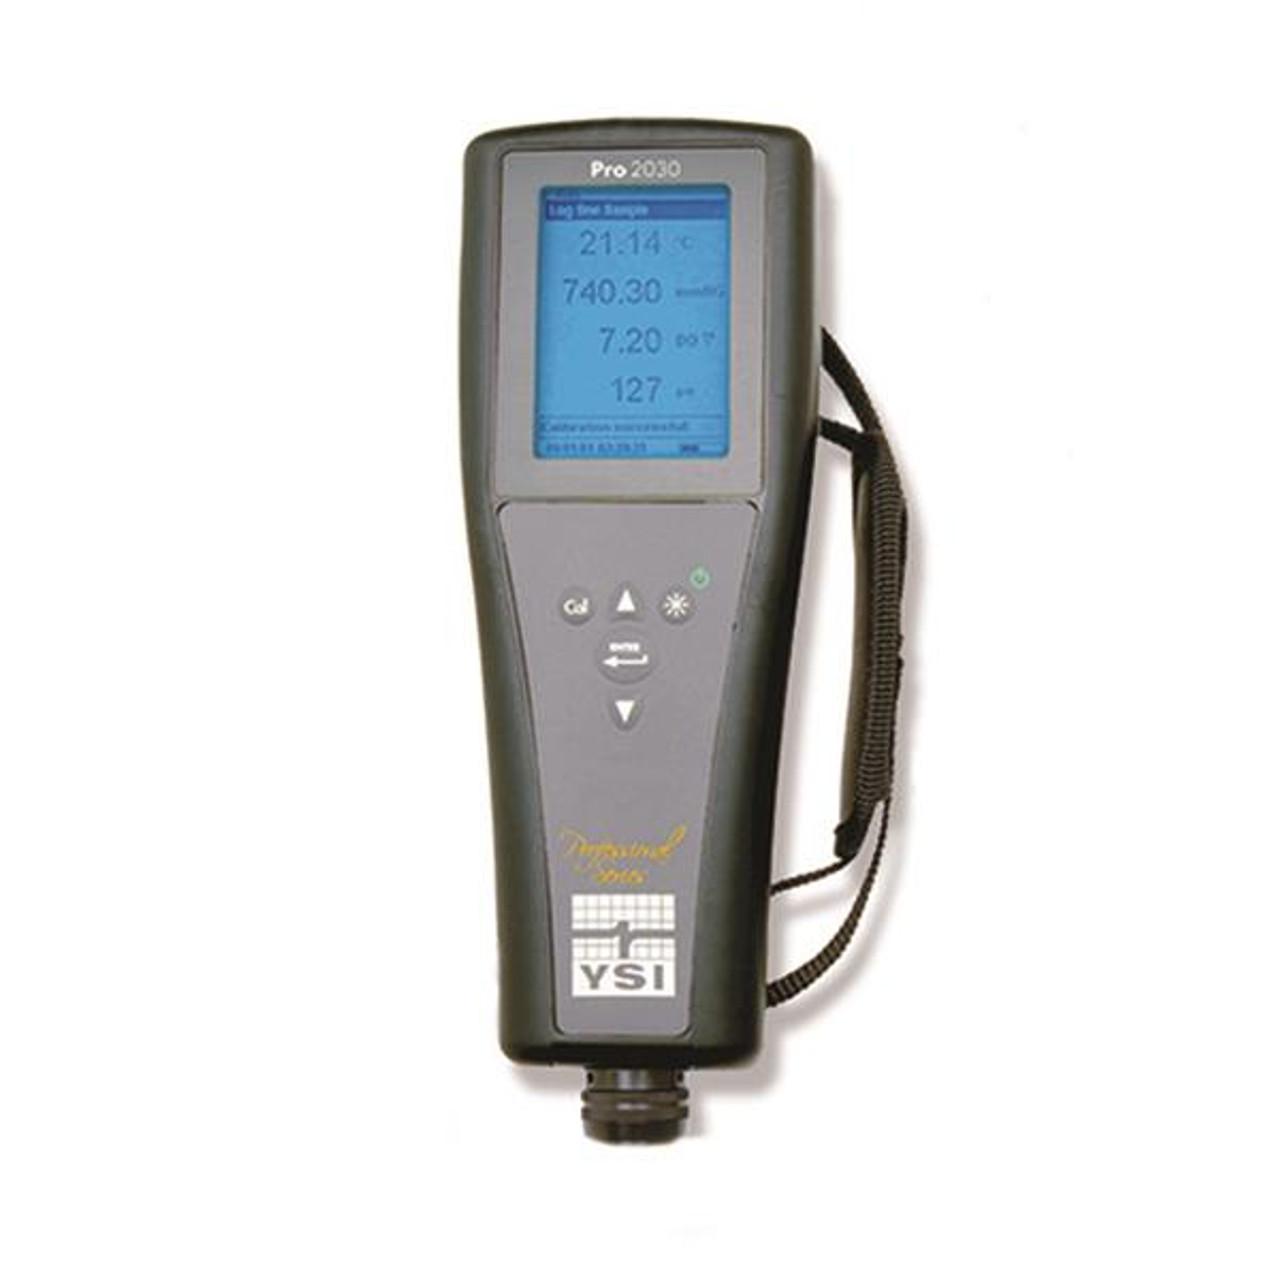 YSI Pro2030 Dissolved Oxygen, Conductivity, Salinity Instrument, (6052030)